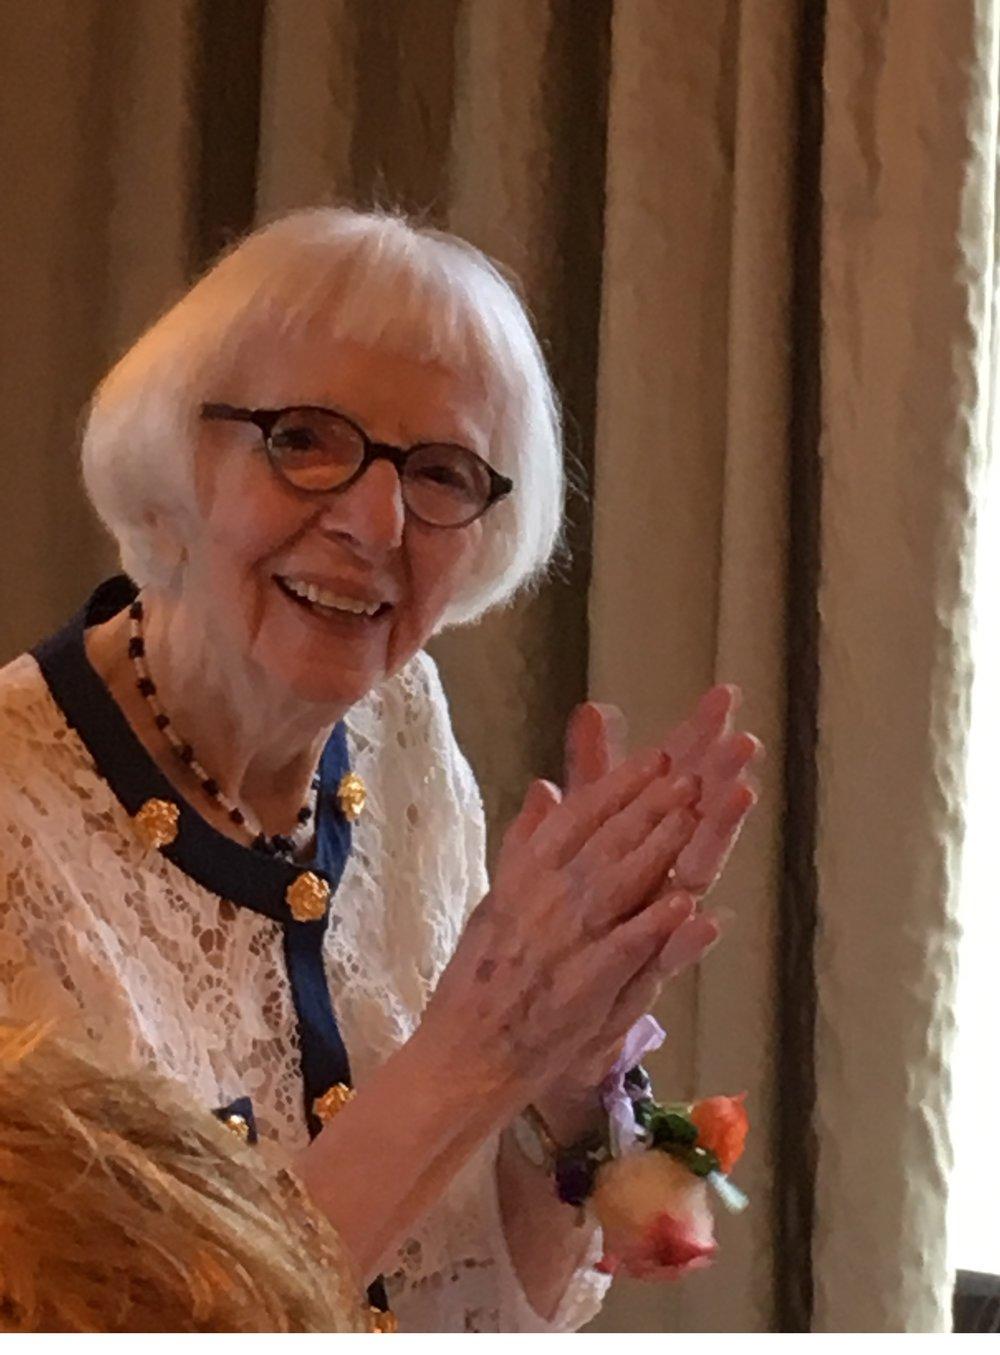 Marjorie Miner on her 100th birthday